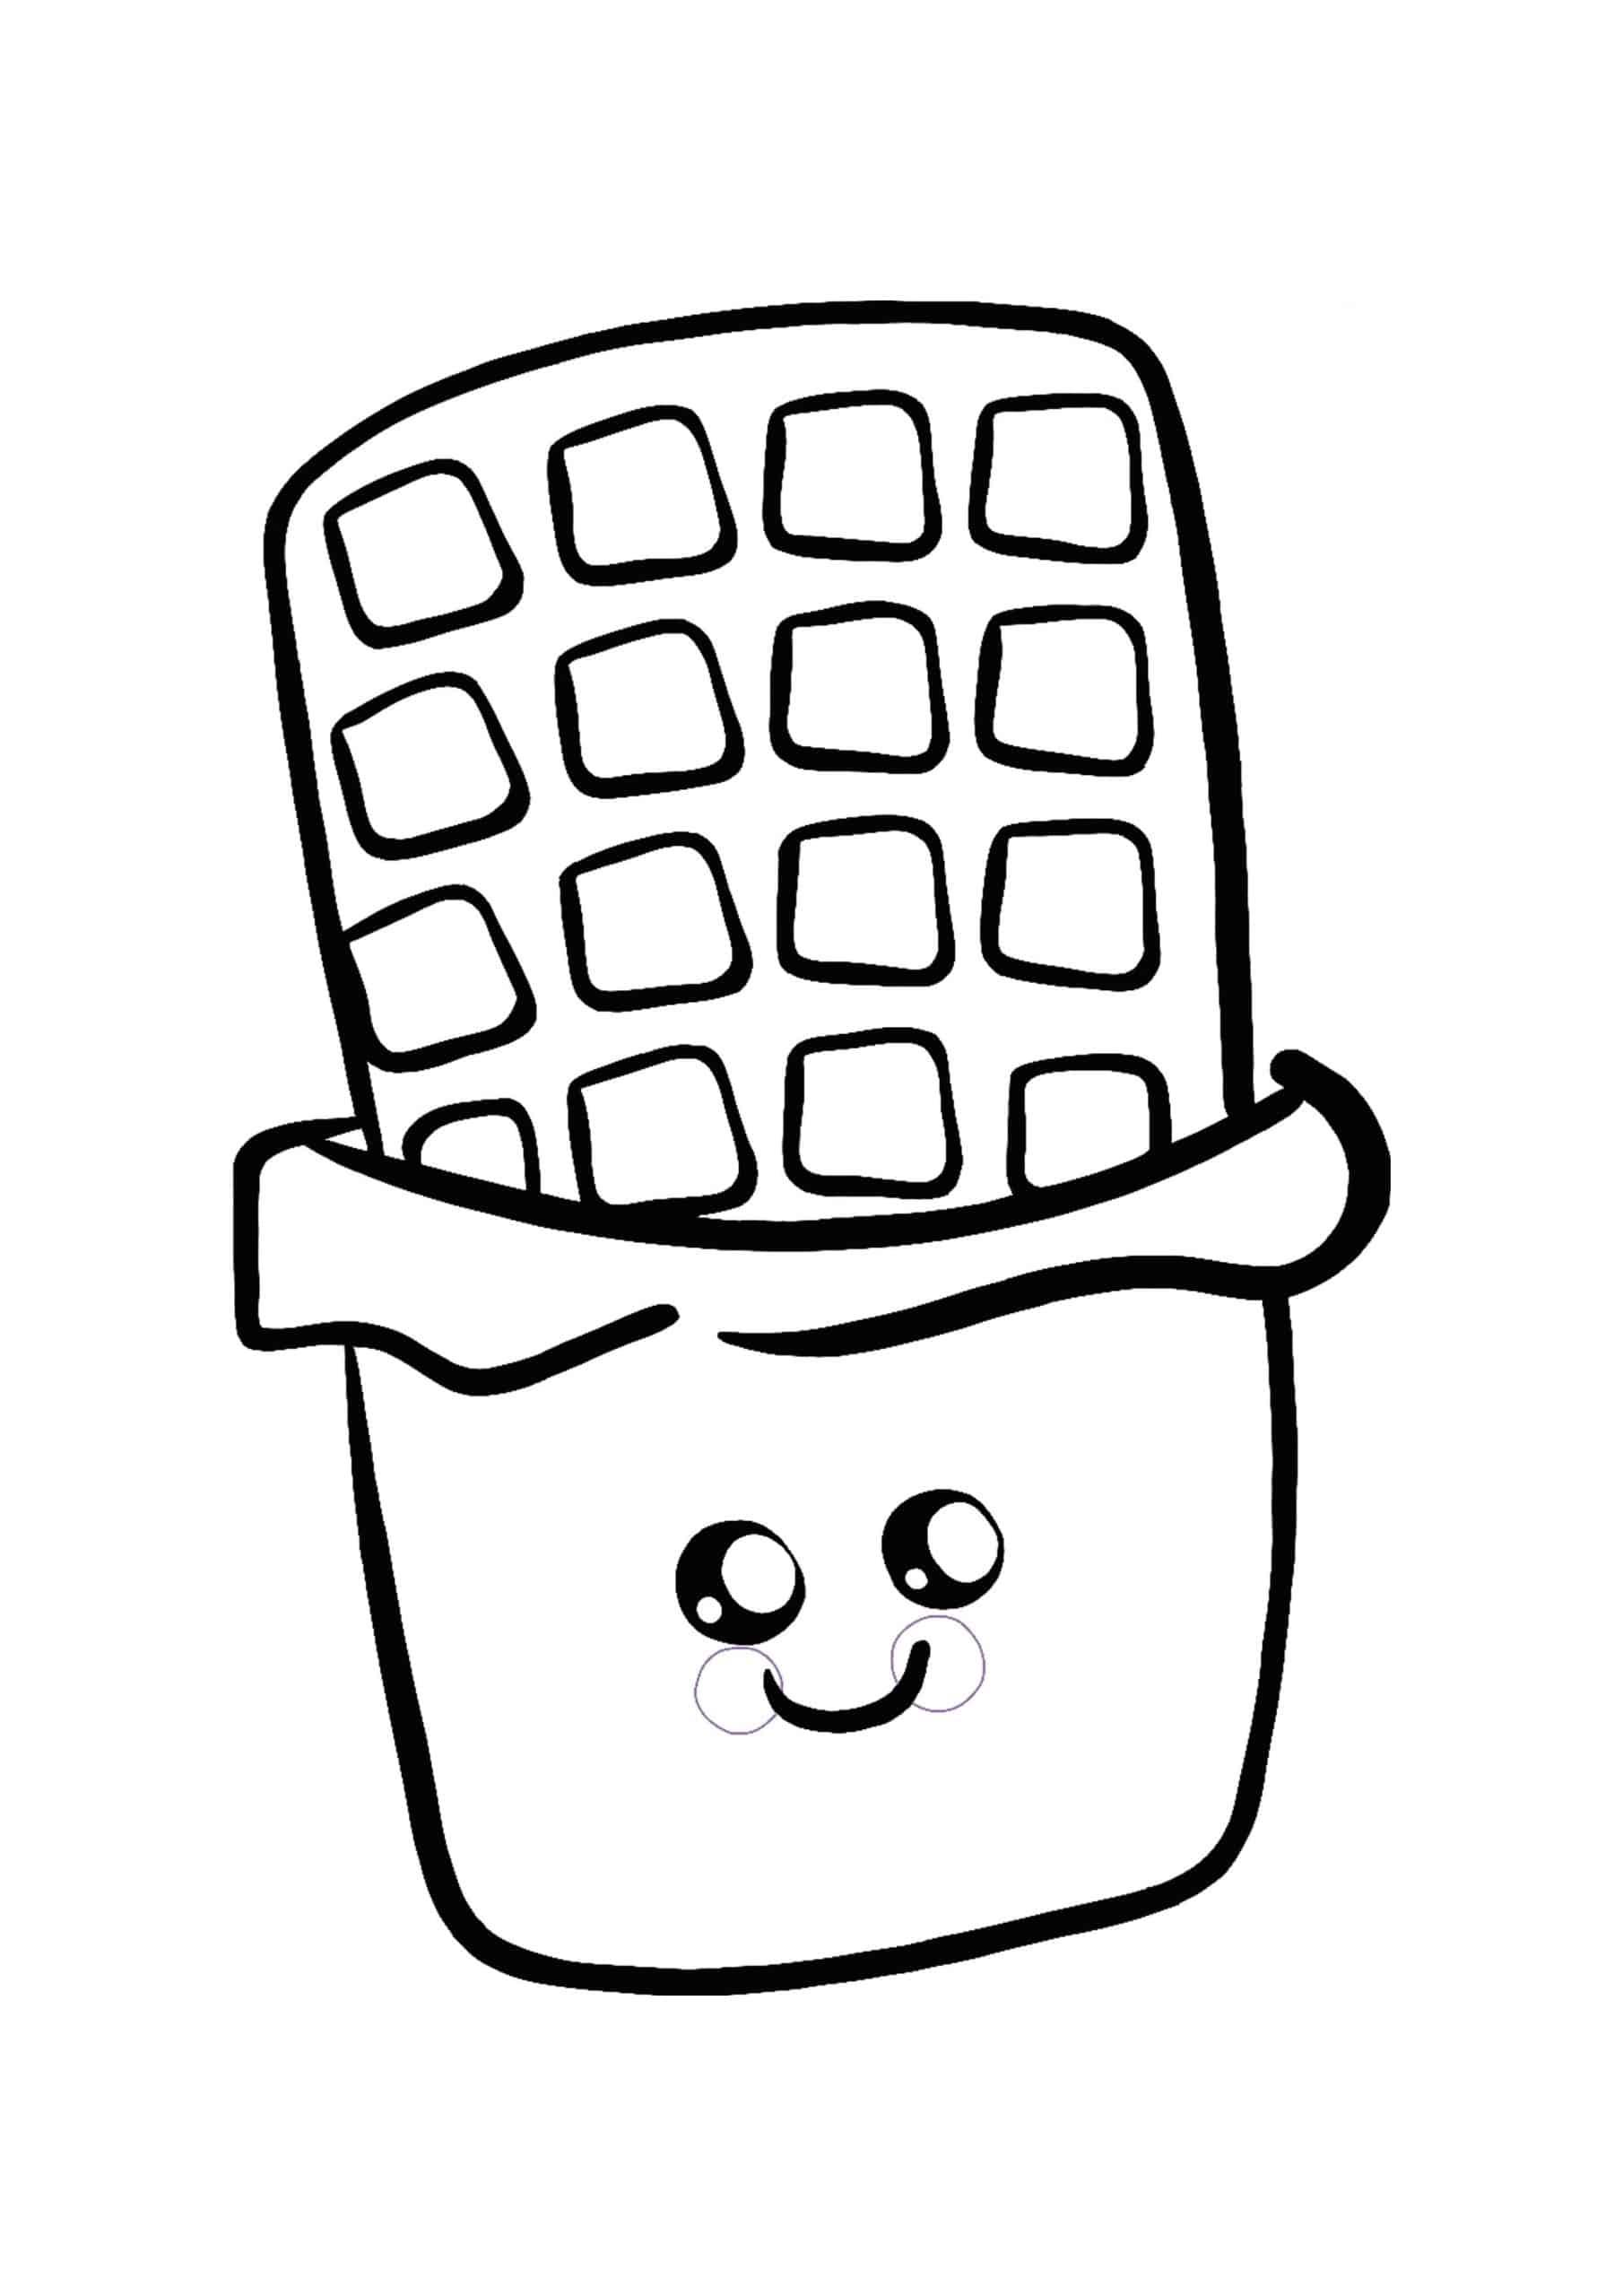 Kawaii Chocolate coloring page